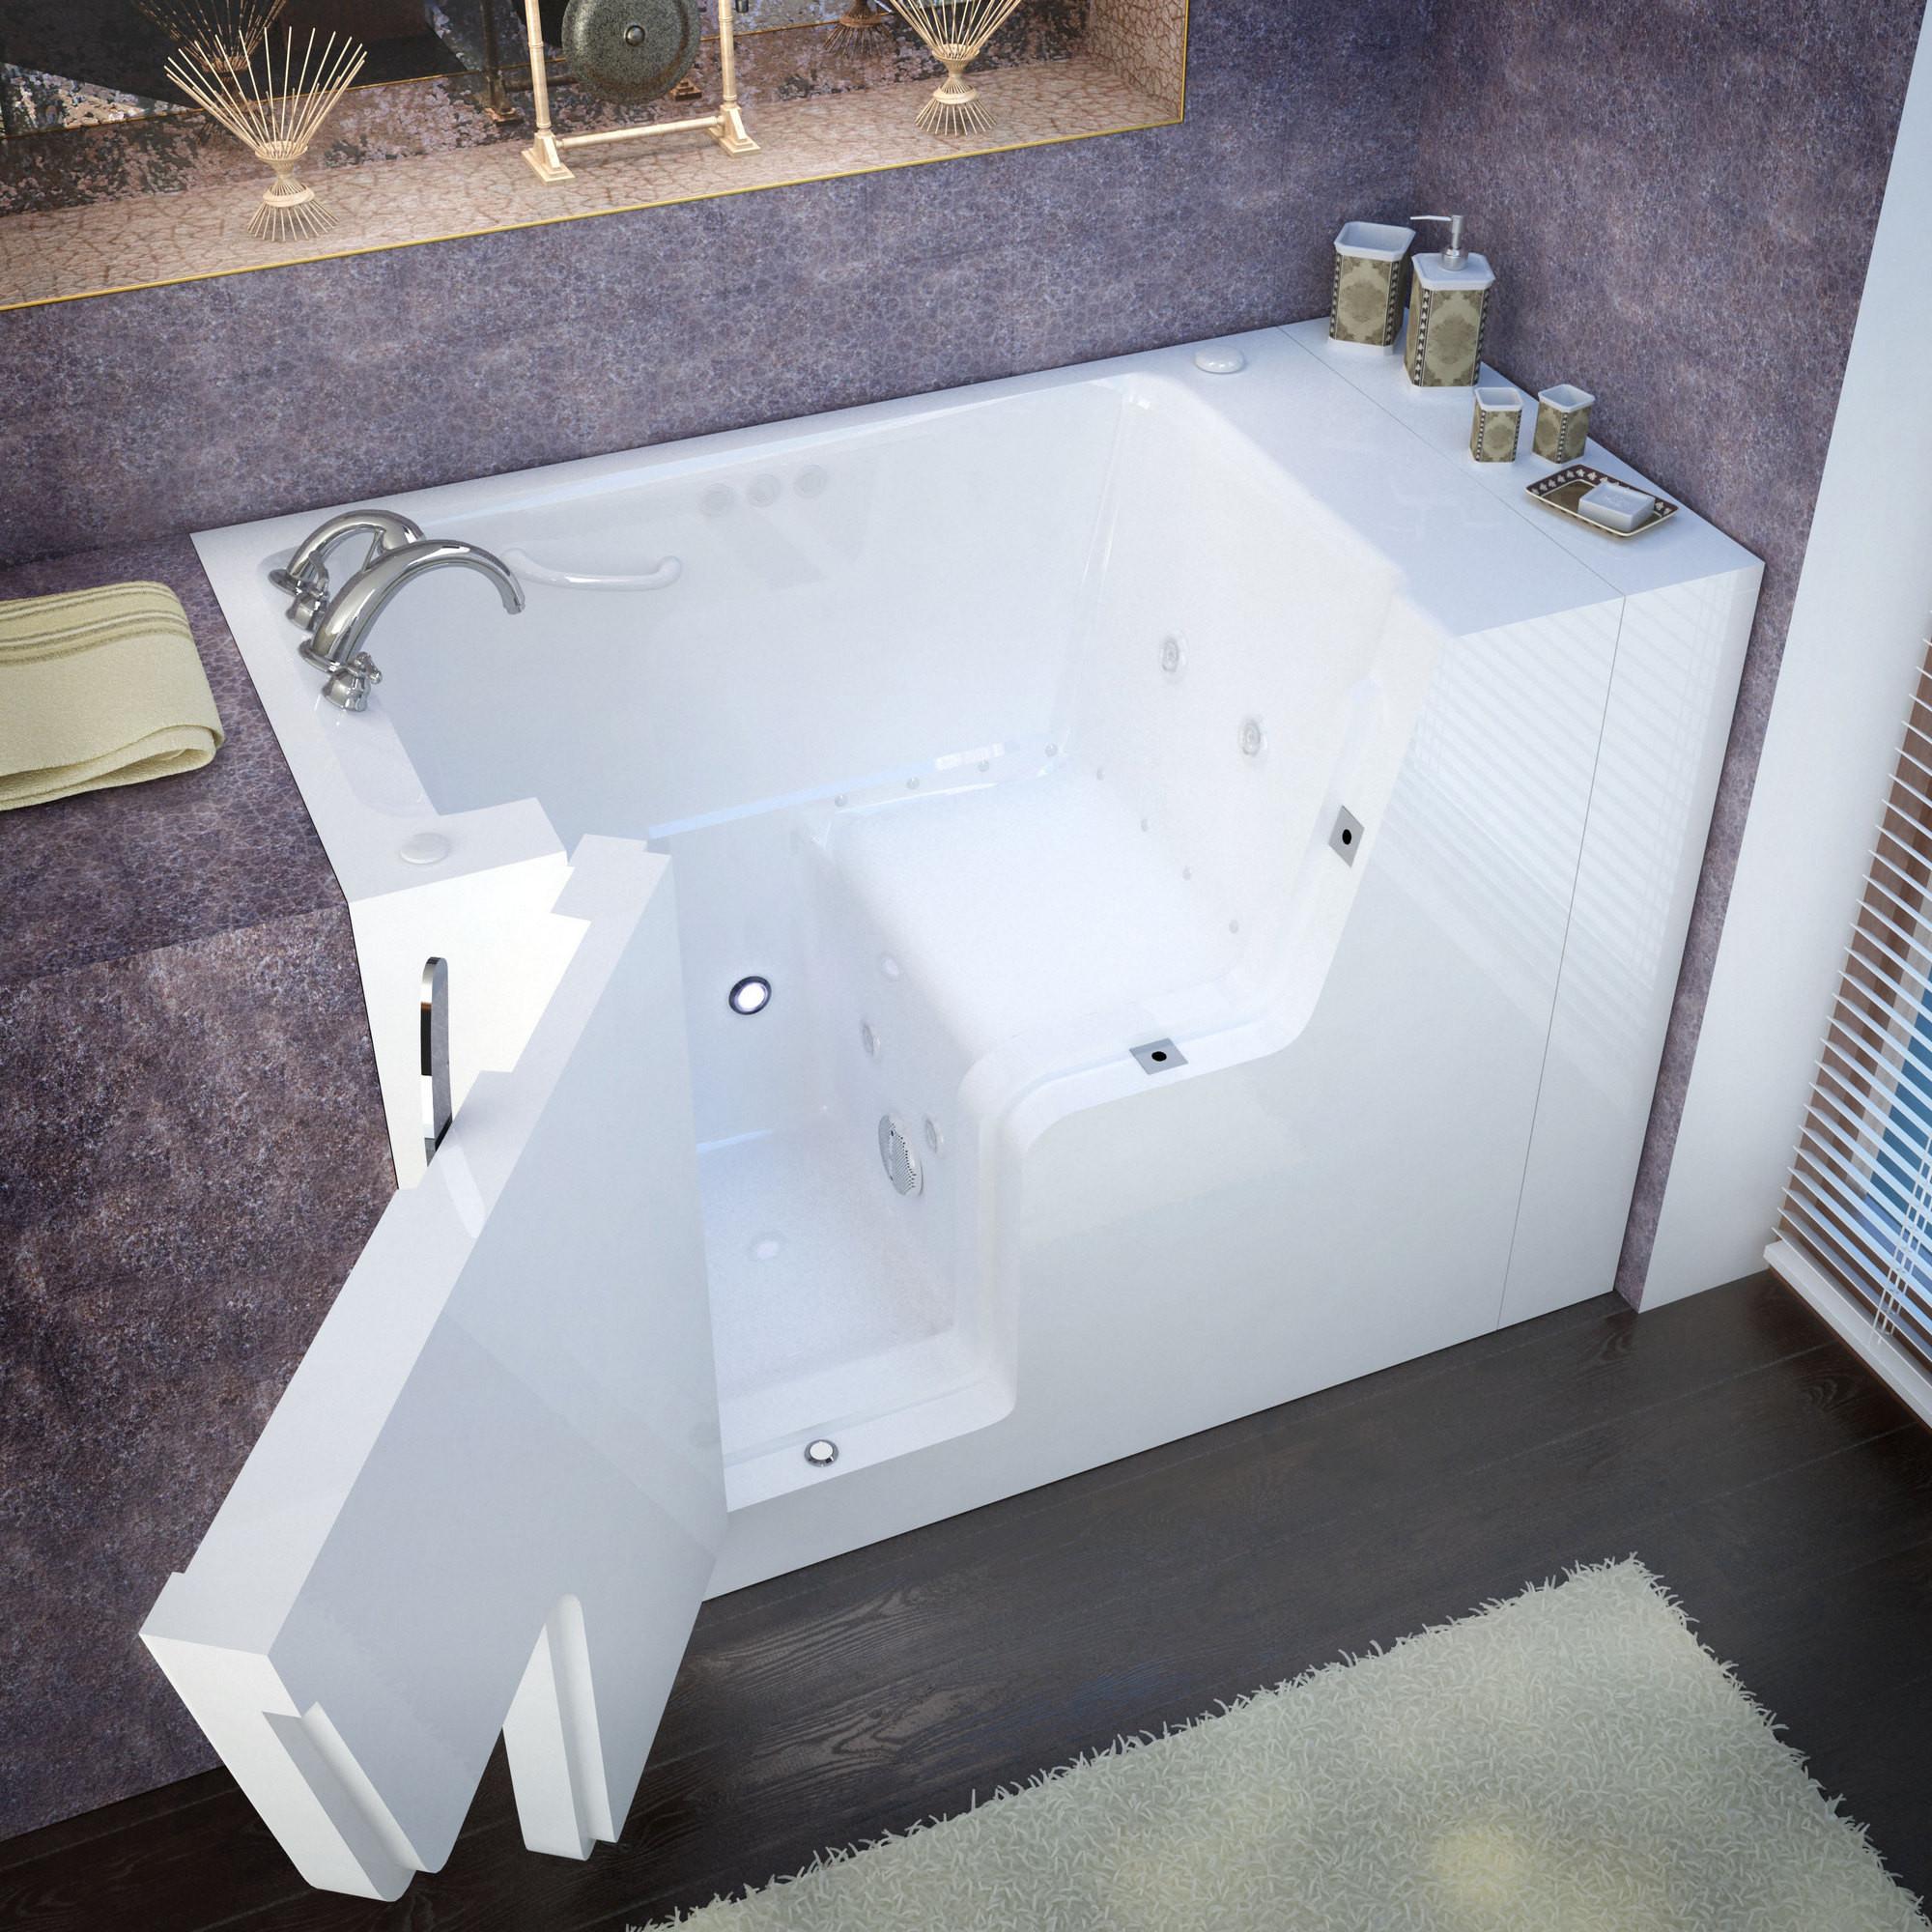 MediTub 2953WCALWD Wheel Chair Accessible Left Drain Whirlpool & Air Jetted Bathtub